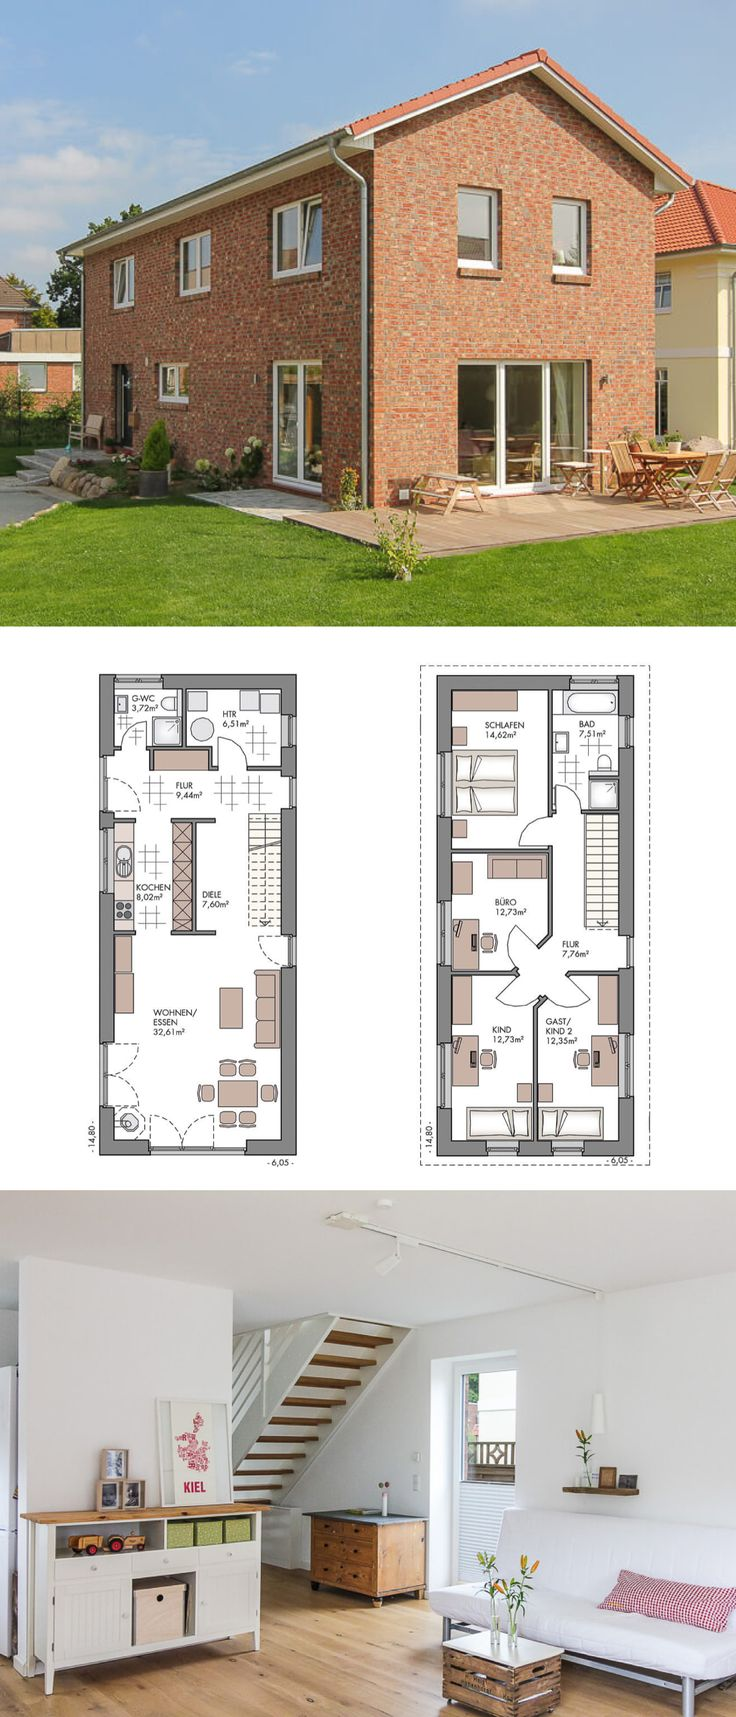 Haus Bauen Kiel 1637 best hausbaudirekt images on architectural drawings